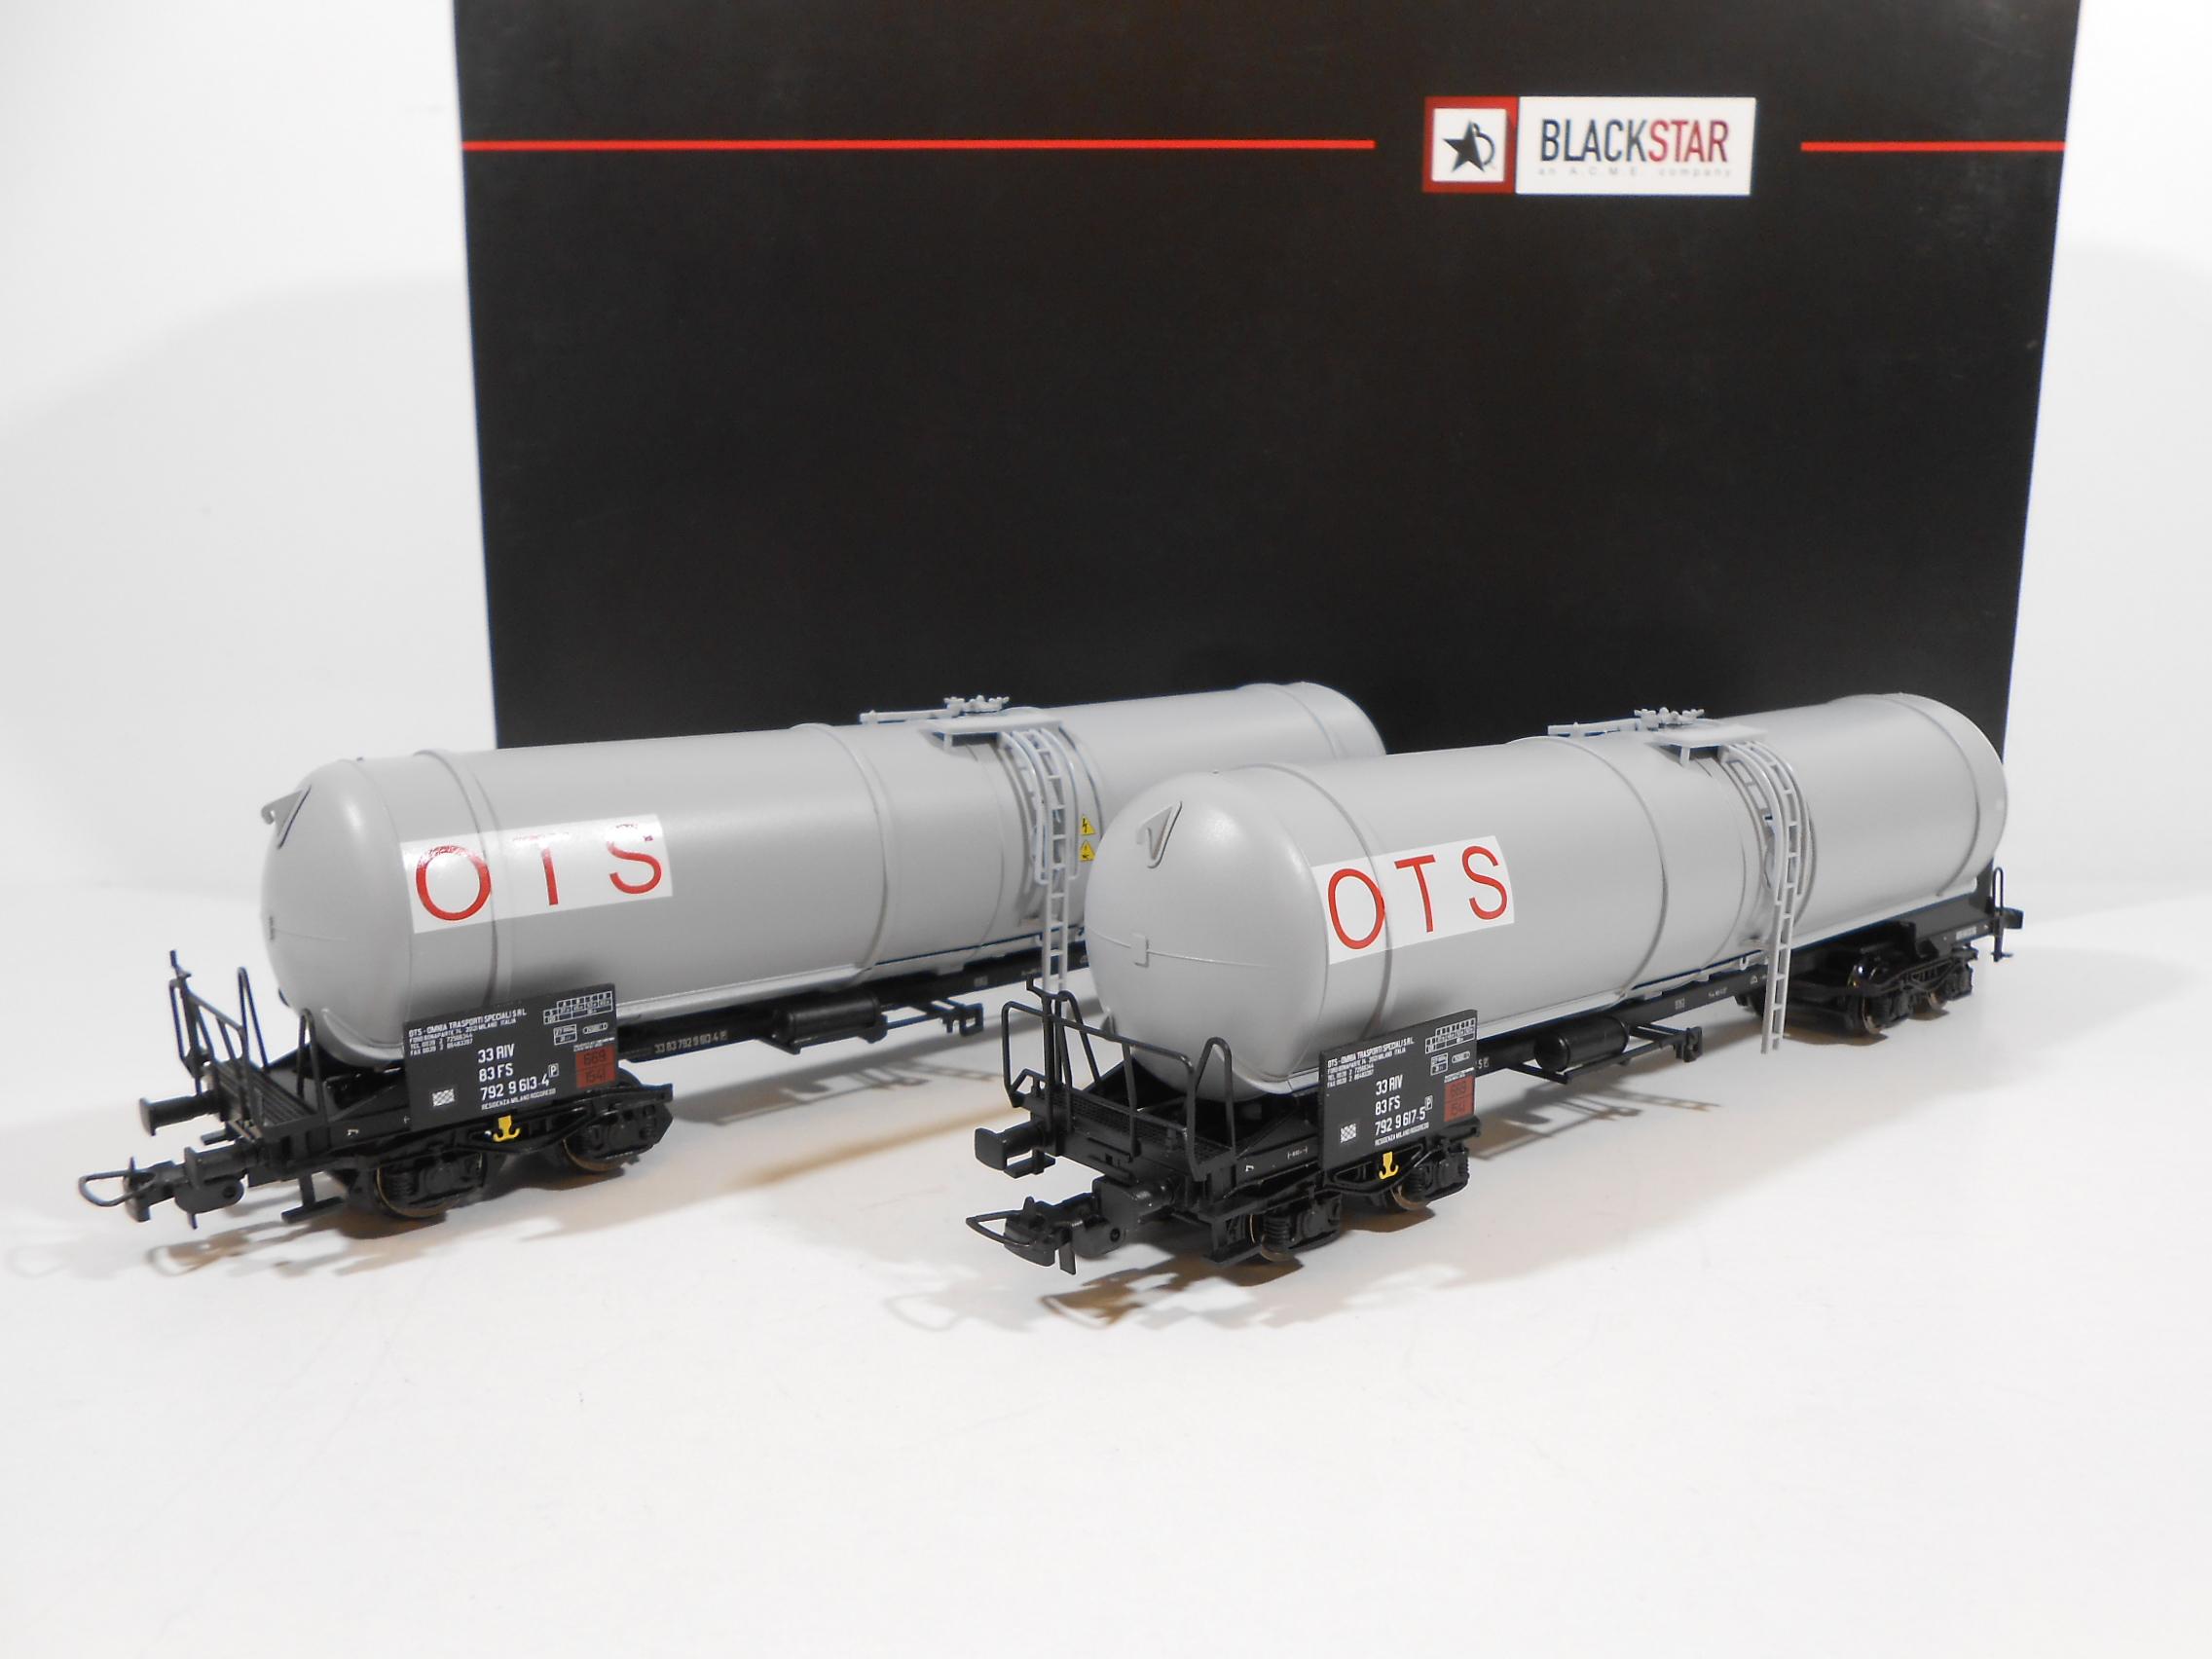 "BLACKSTAR BS00024-501706 - Set due cisterne Zans ""OTS"" livrea grigia epoca VI"